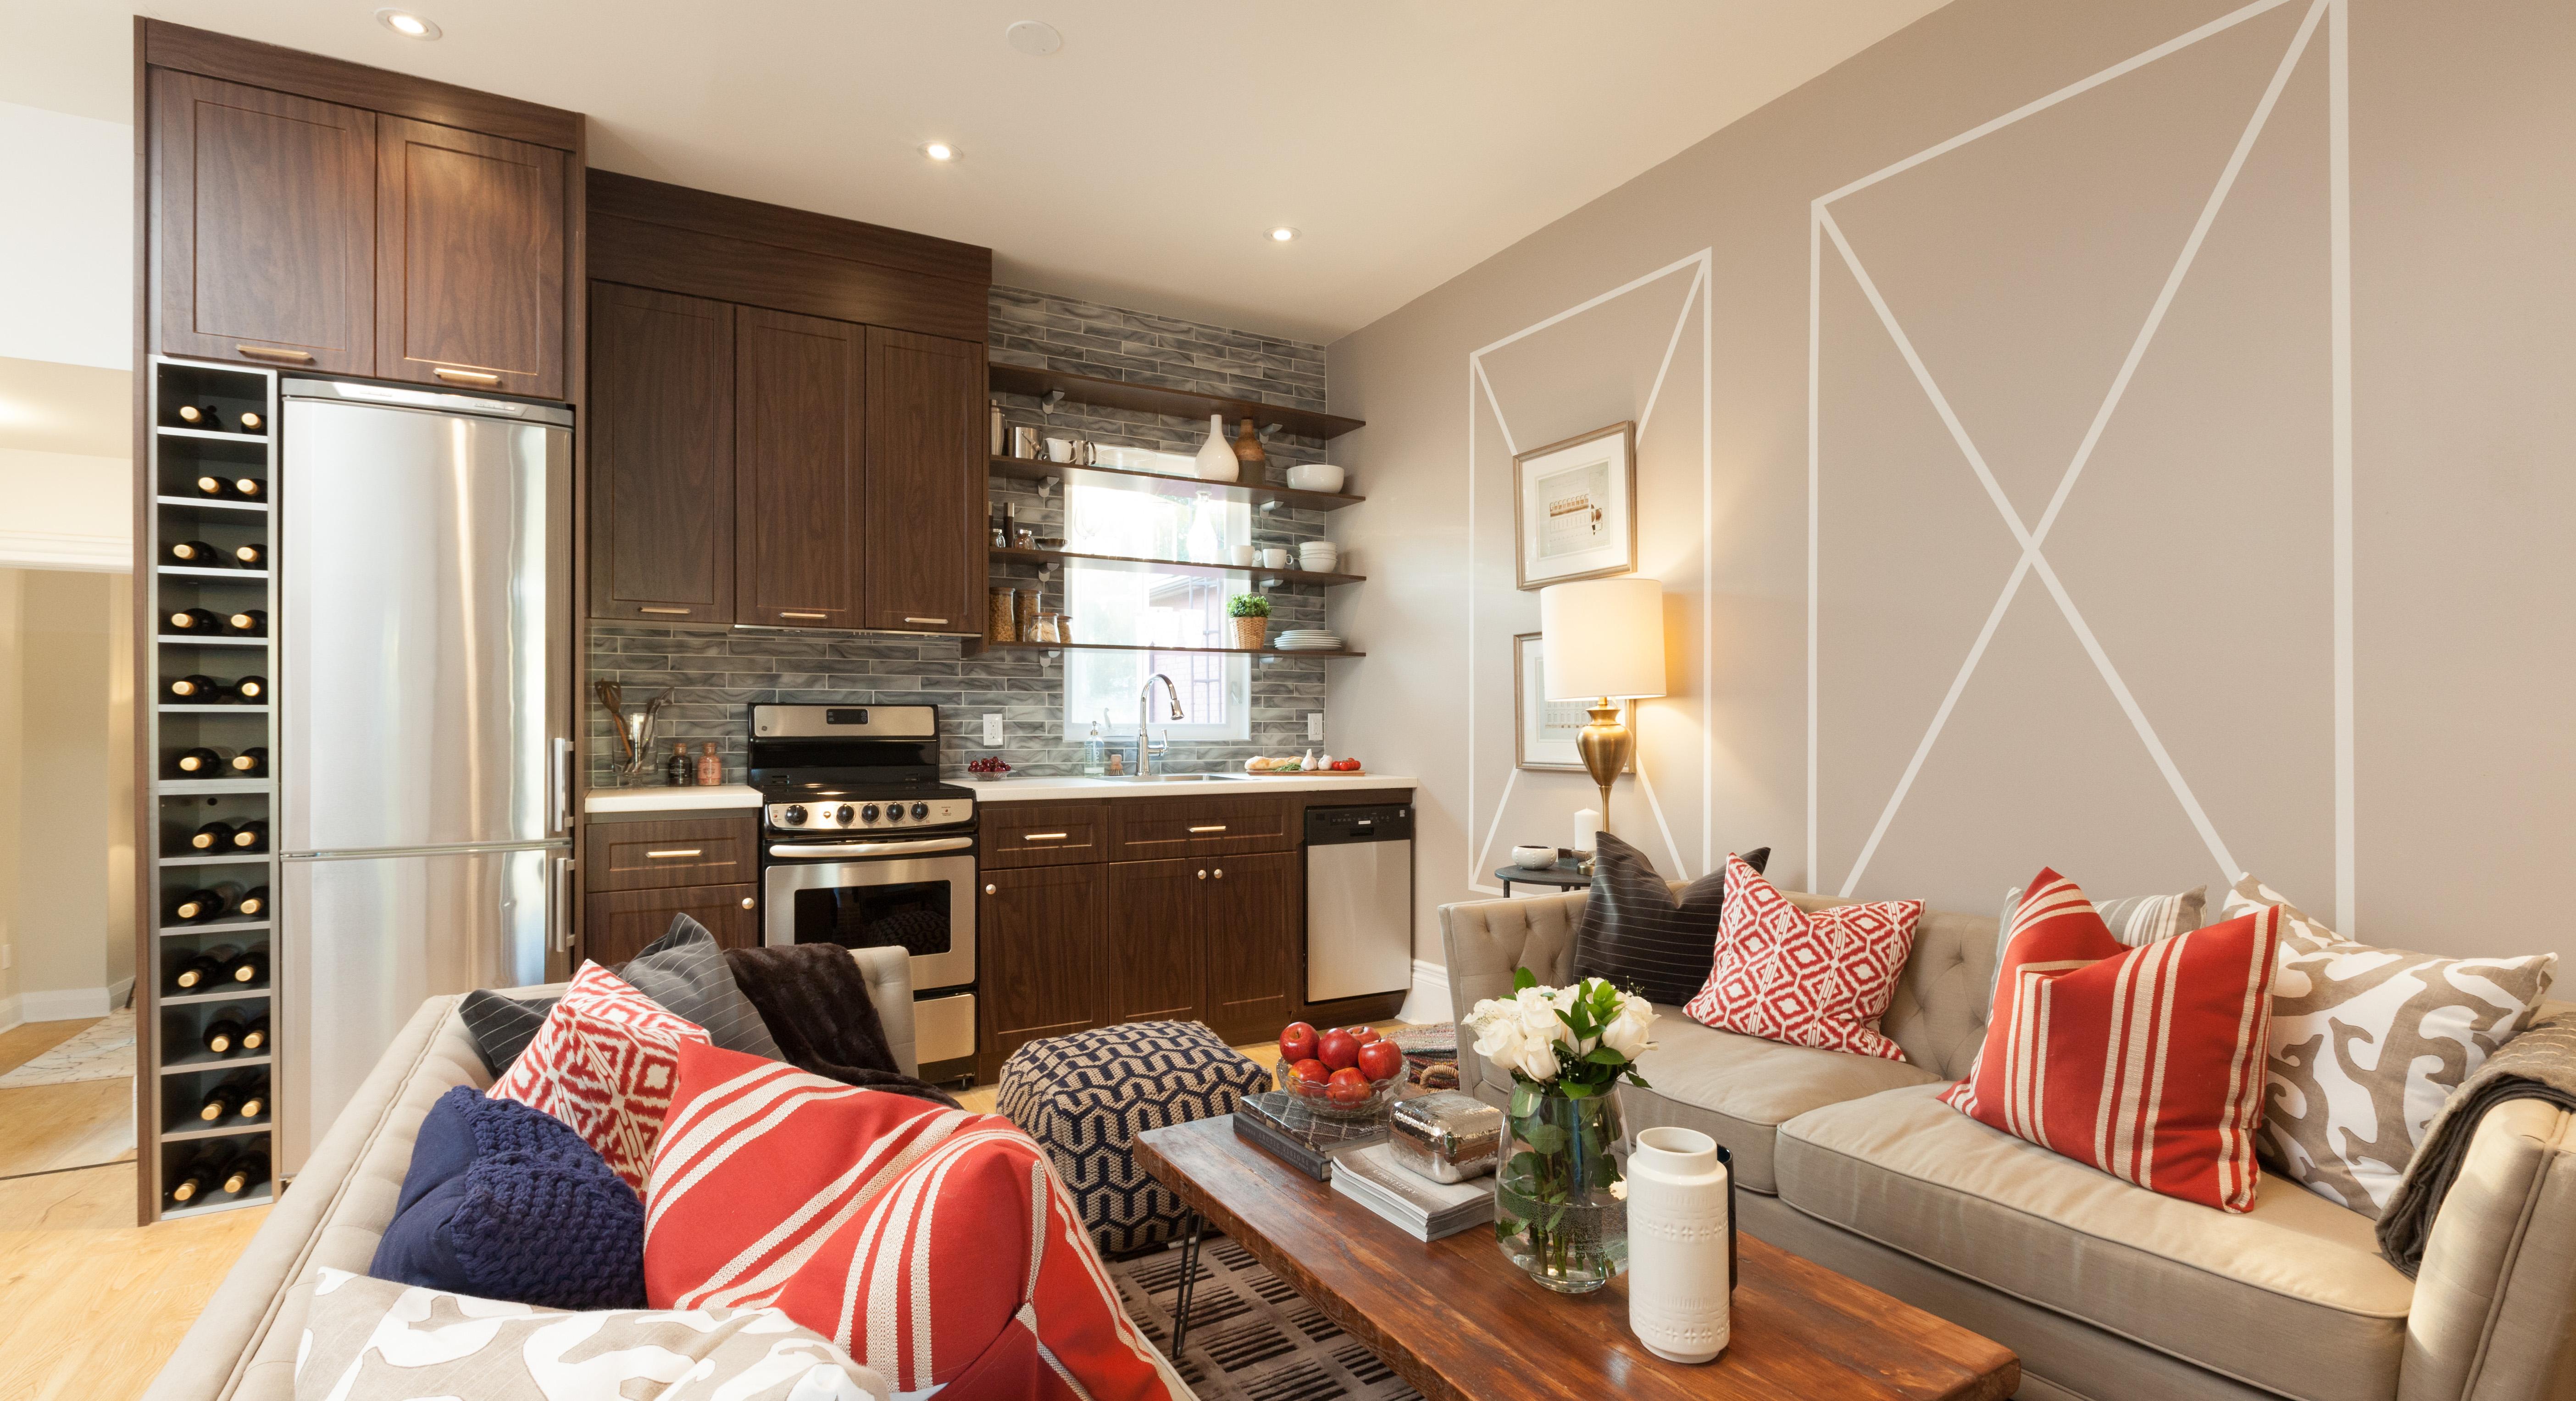 Income Based Apartments For Rent In Cincinnati Ohio